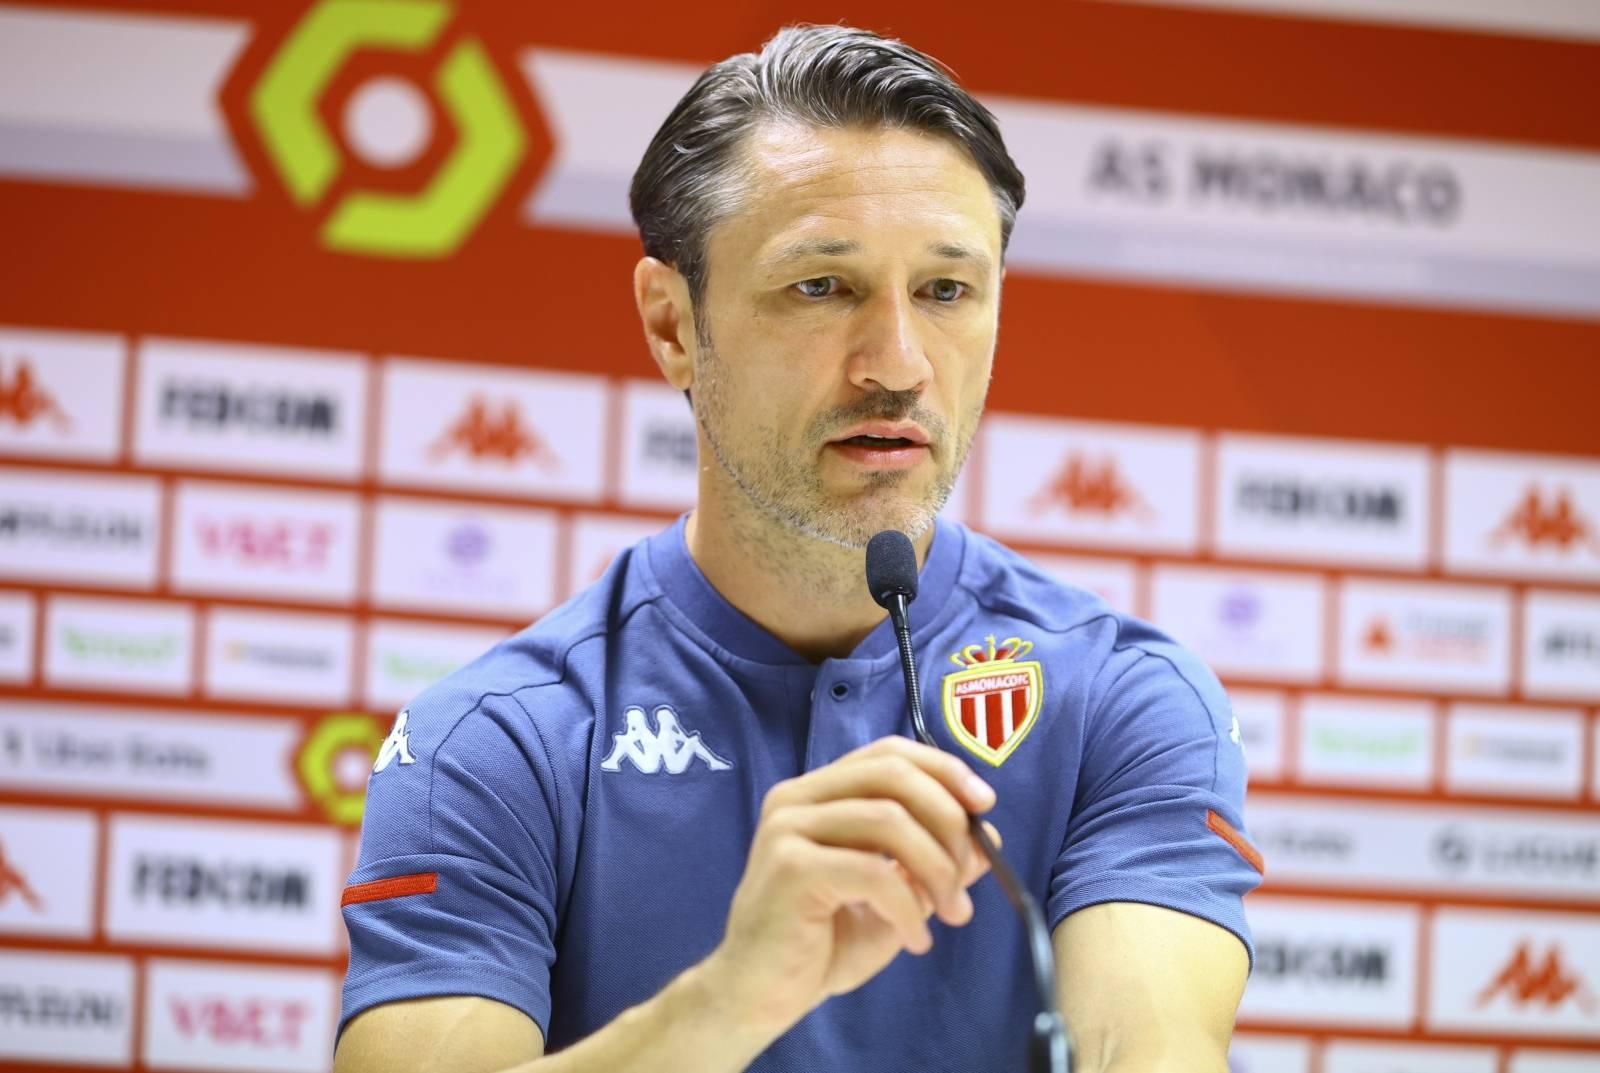 Press Conference AS Monaco - Stade Rennais FC with Niko Kovac